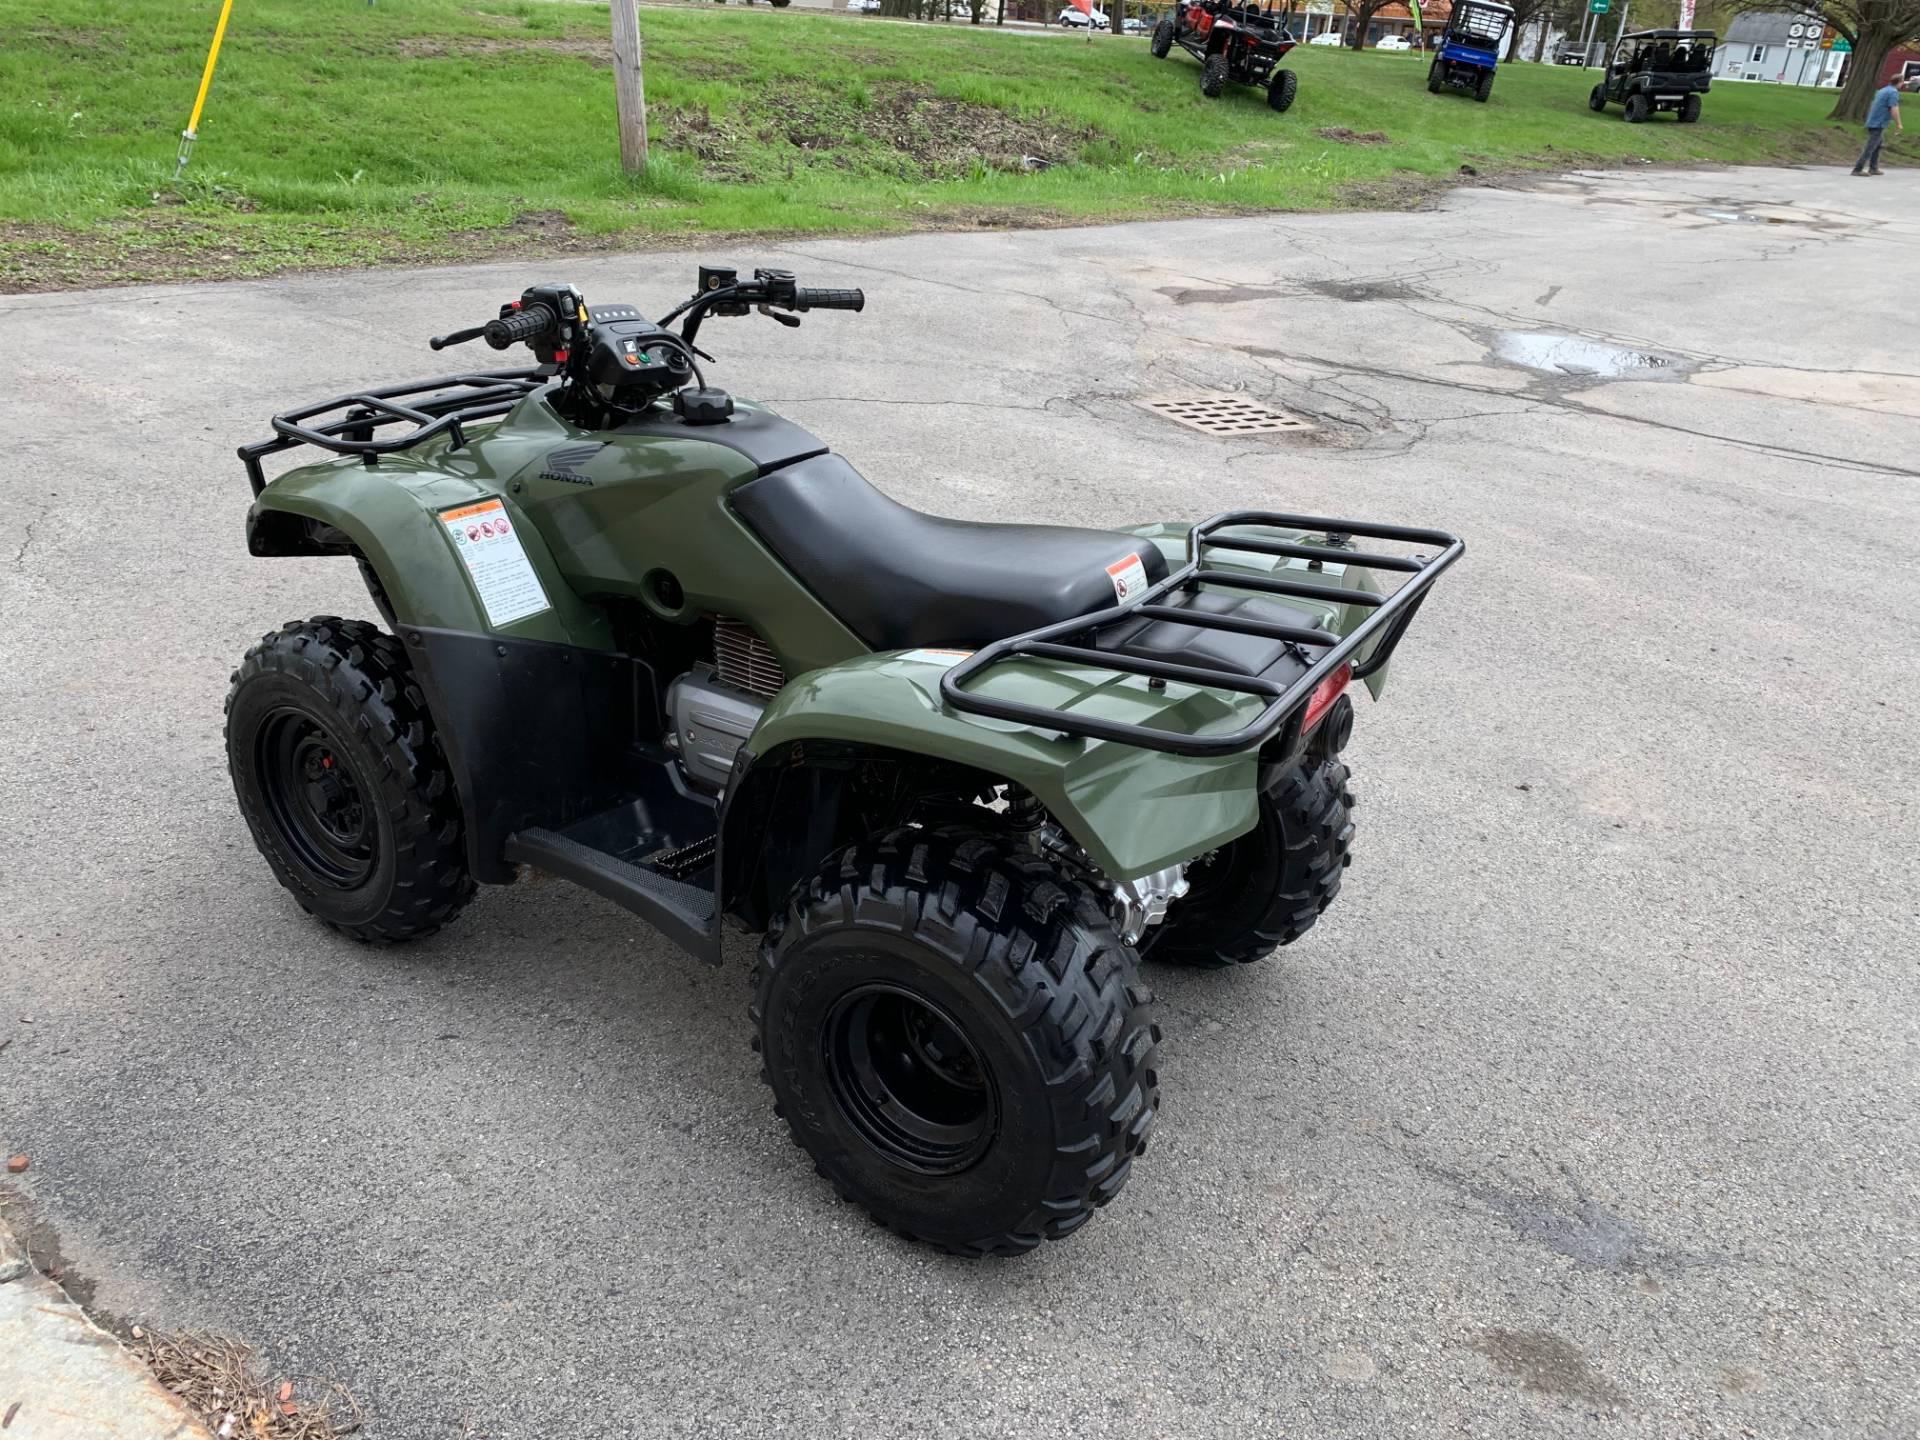 2014 Honda FourTrax Recon 9